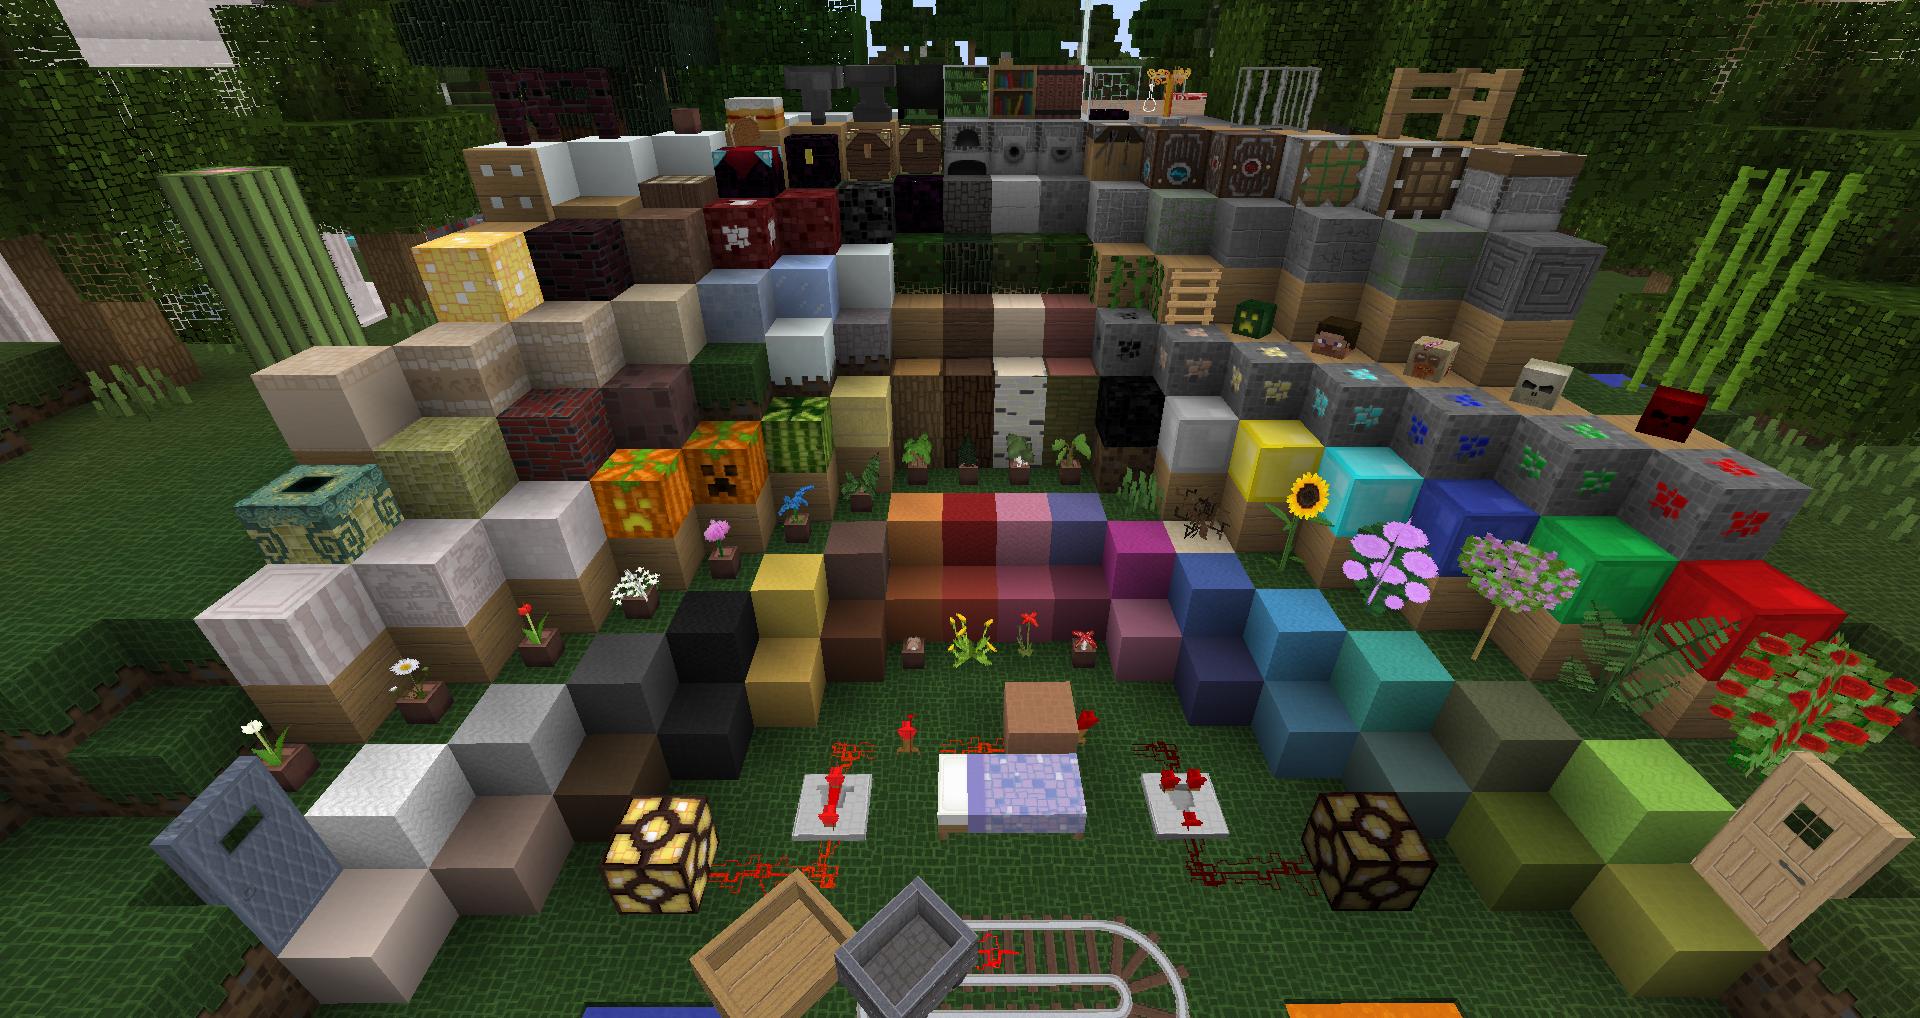 minecraft textures packs pour minecraft. Black Bedroom Furniture Sets. Home Design Ideas